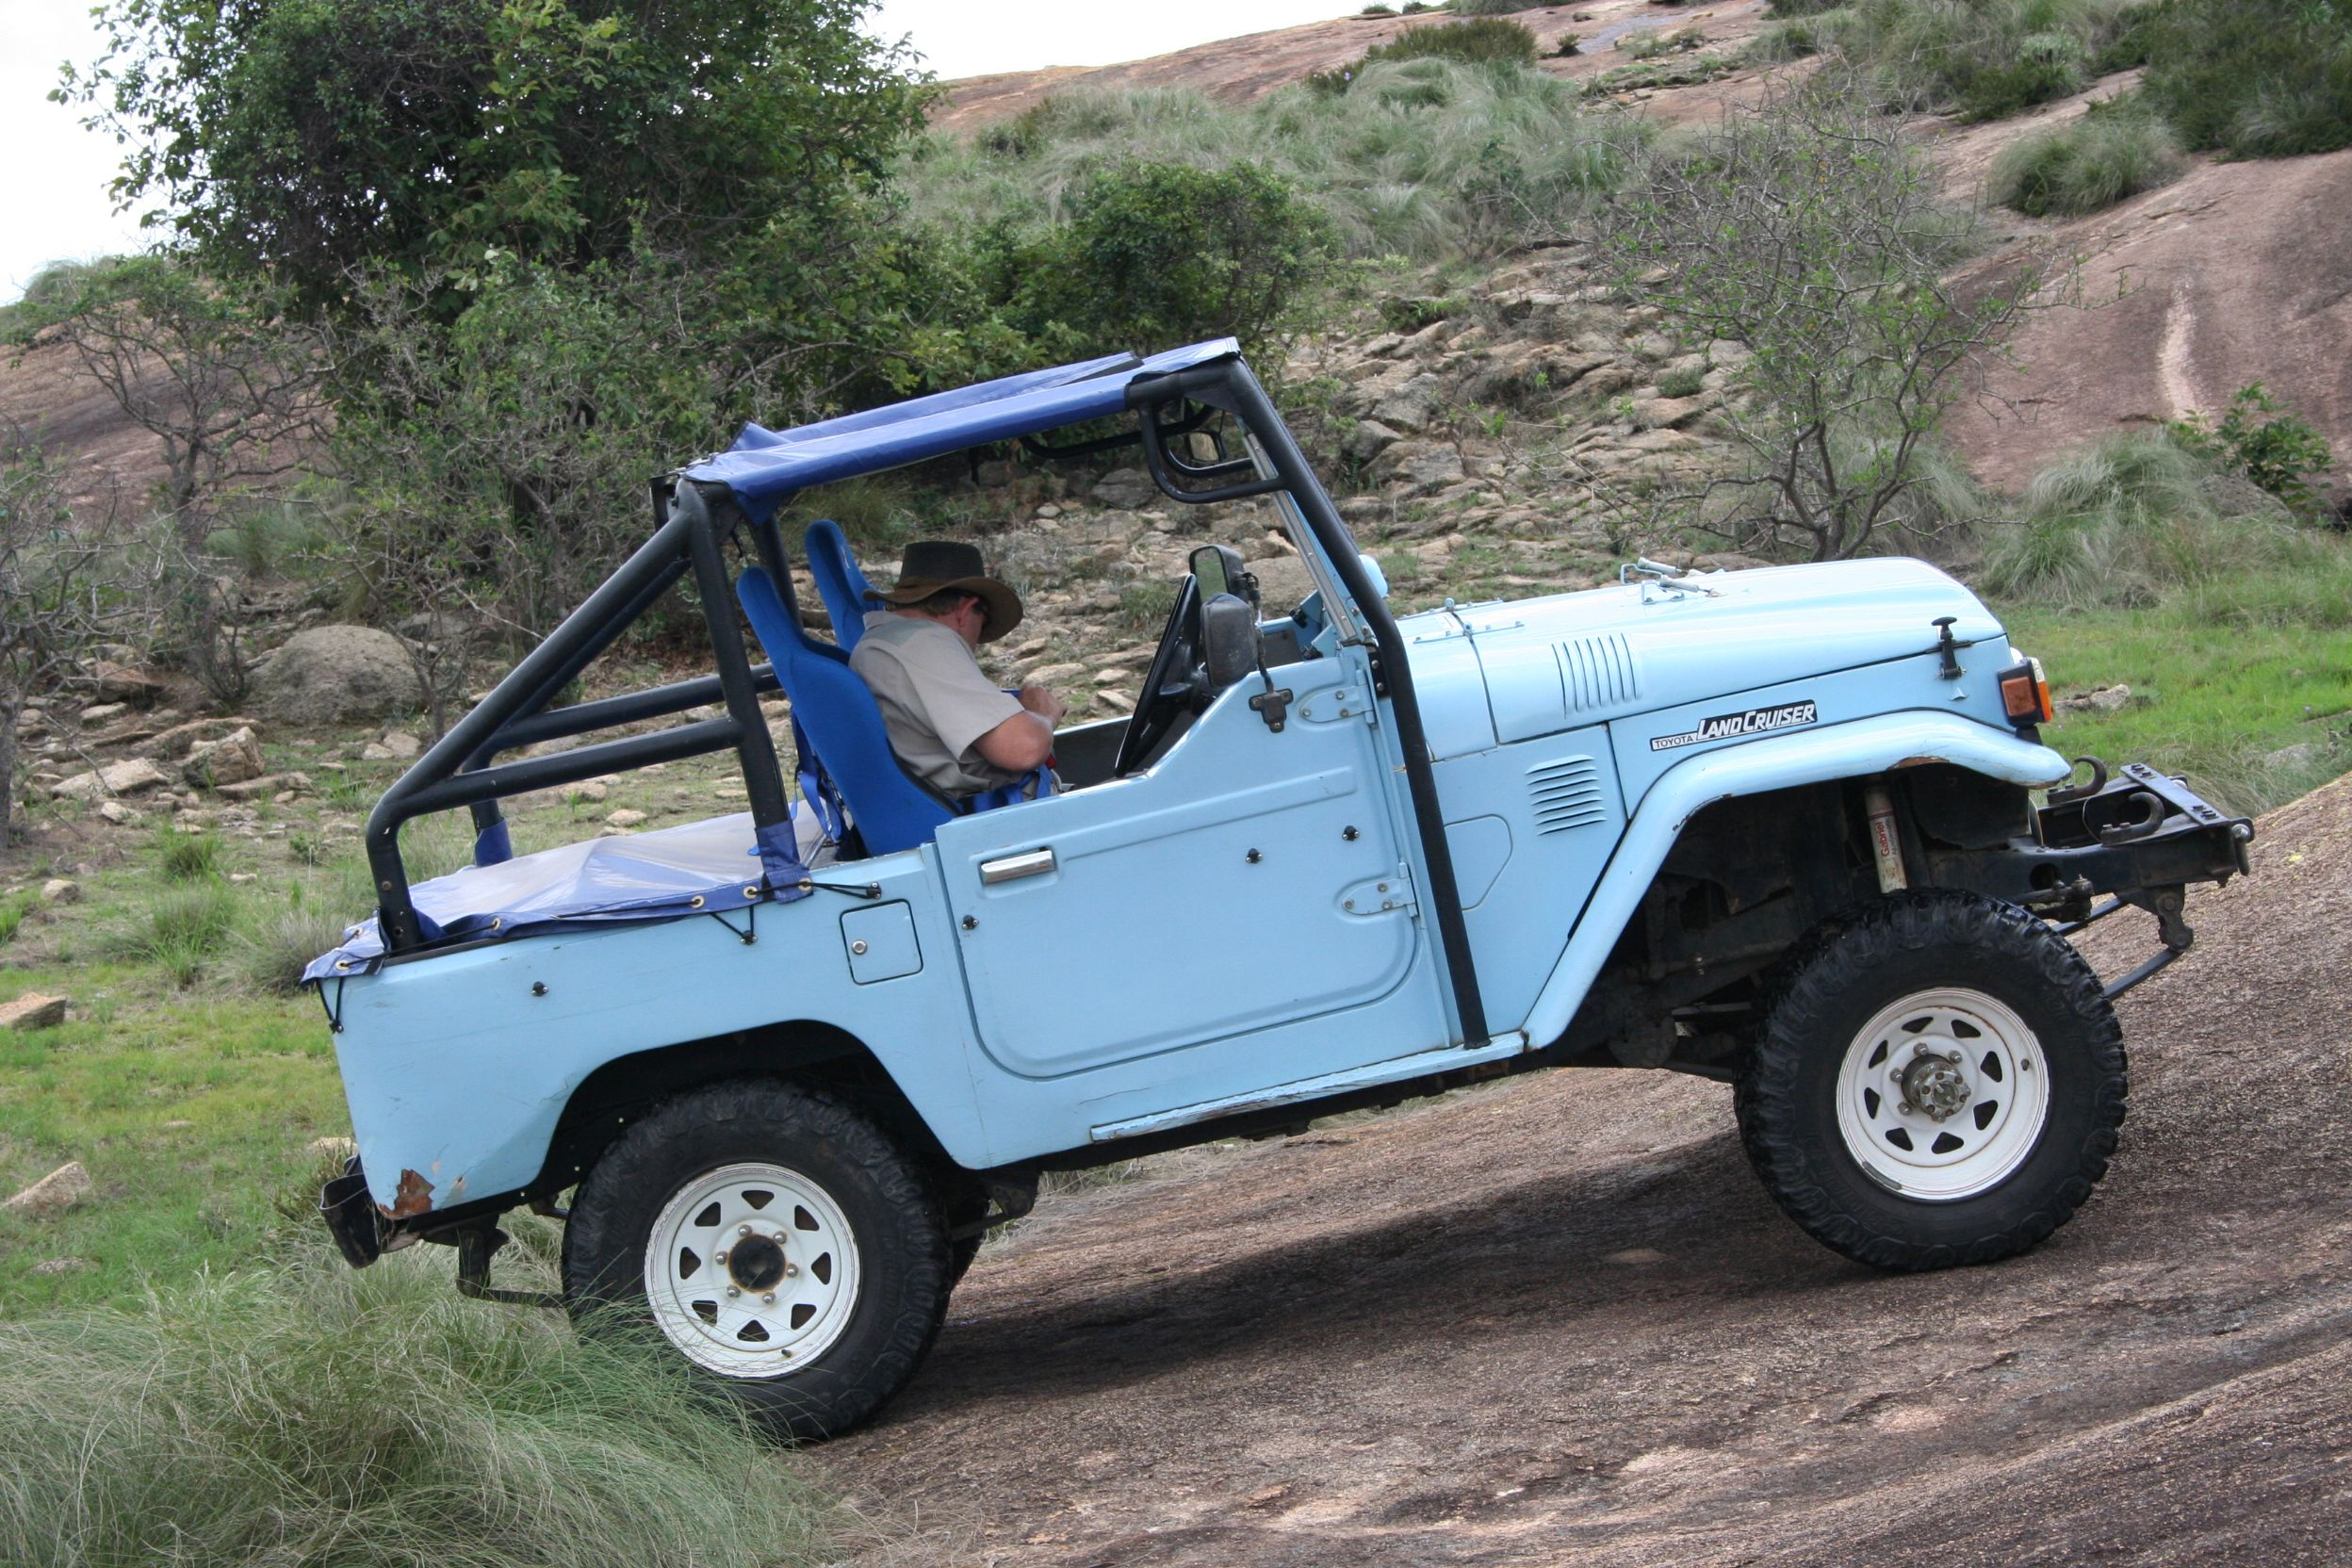 Wheeling A Piece Of Granite Rock In Zimbabwe Fj40 Toyota Fj40 Fj40 Land Cruiser